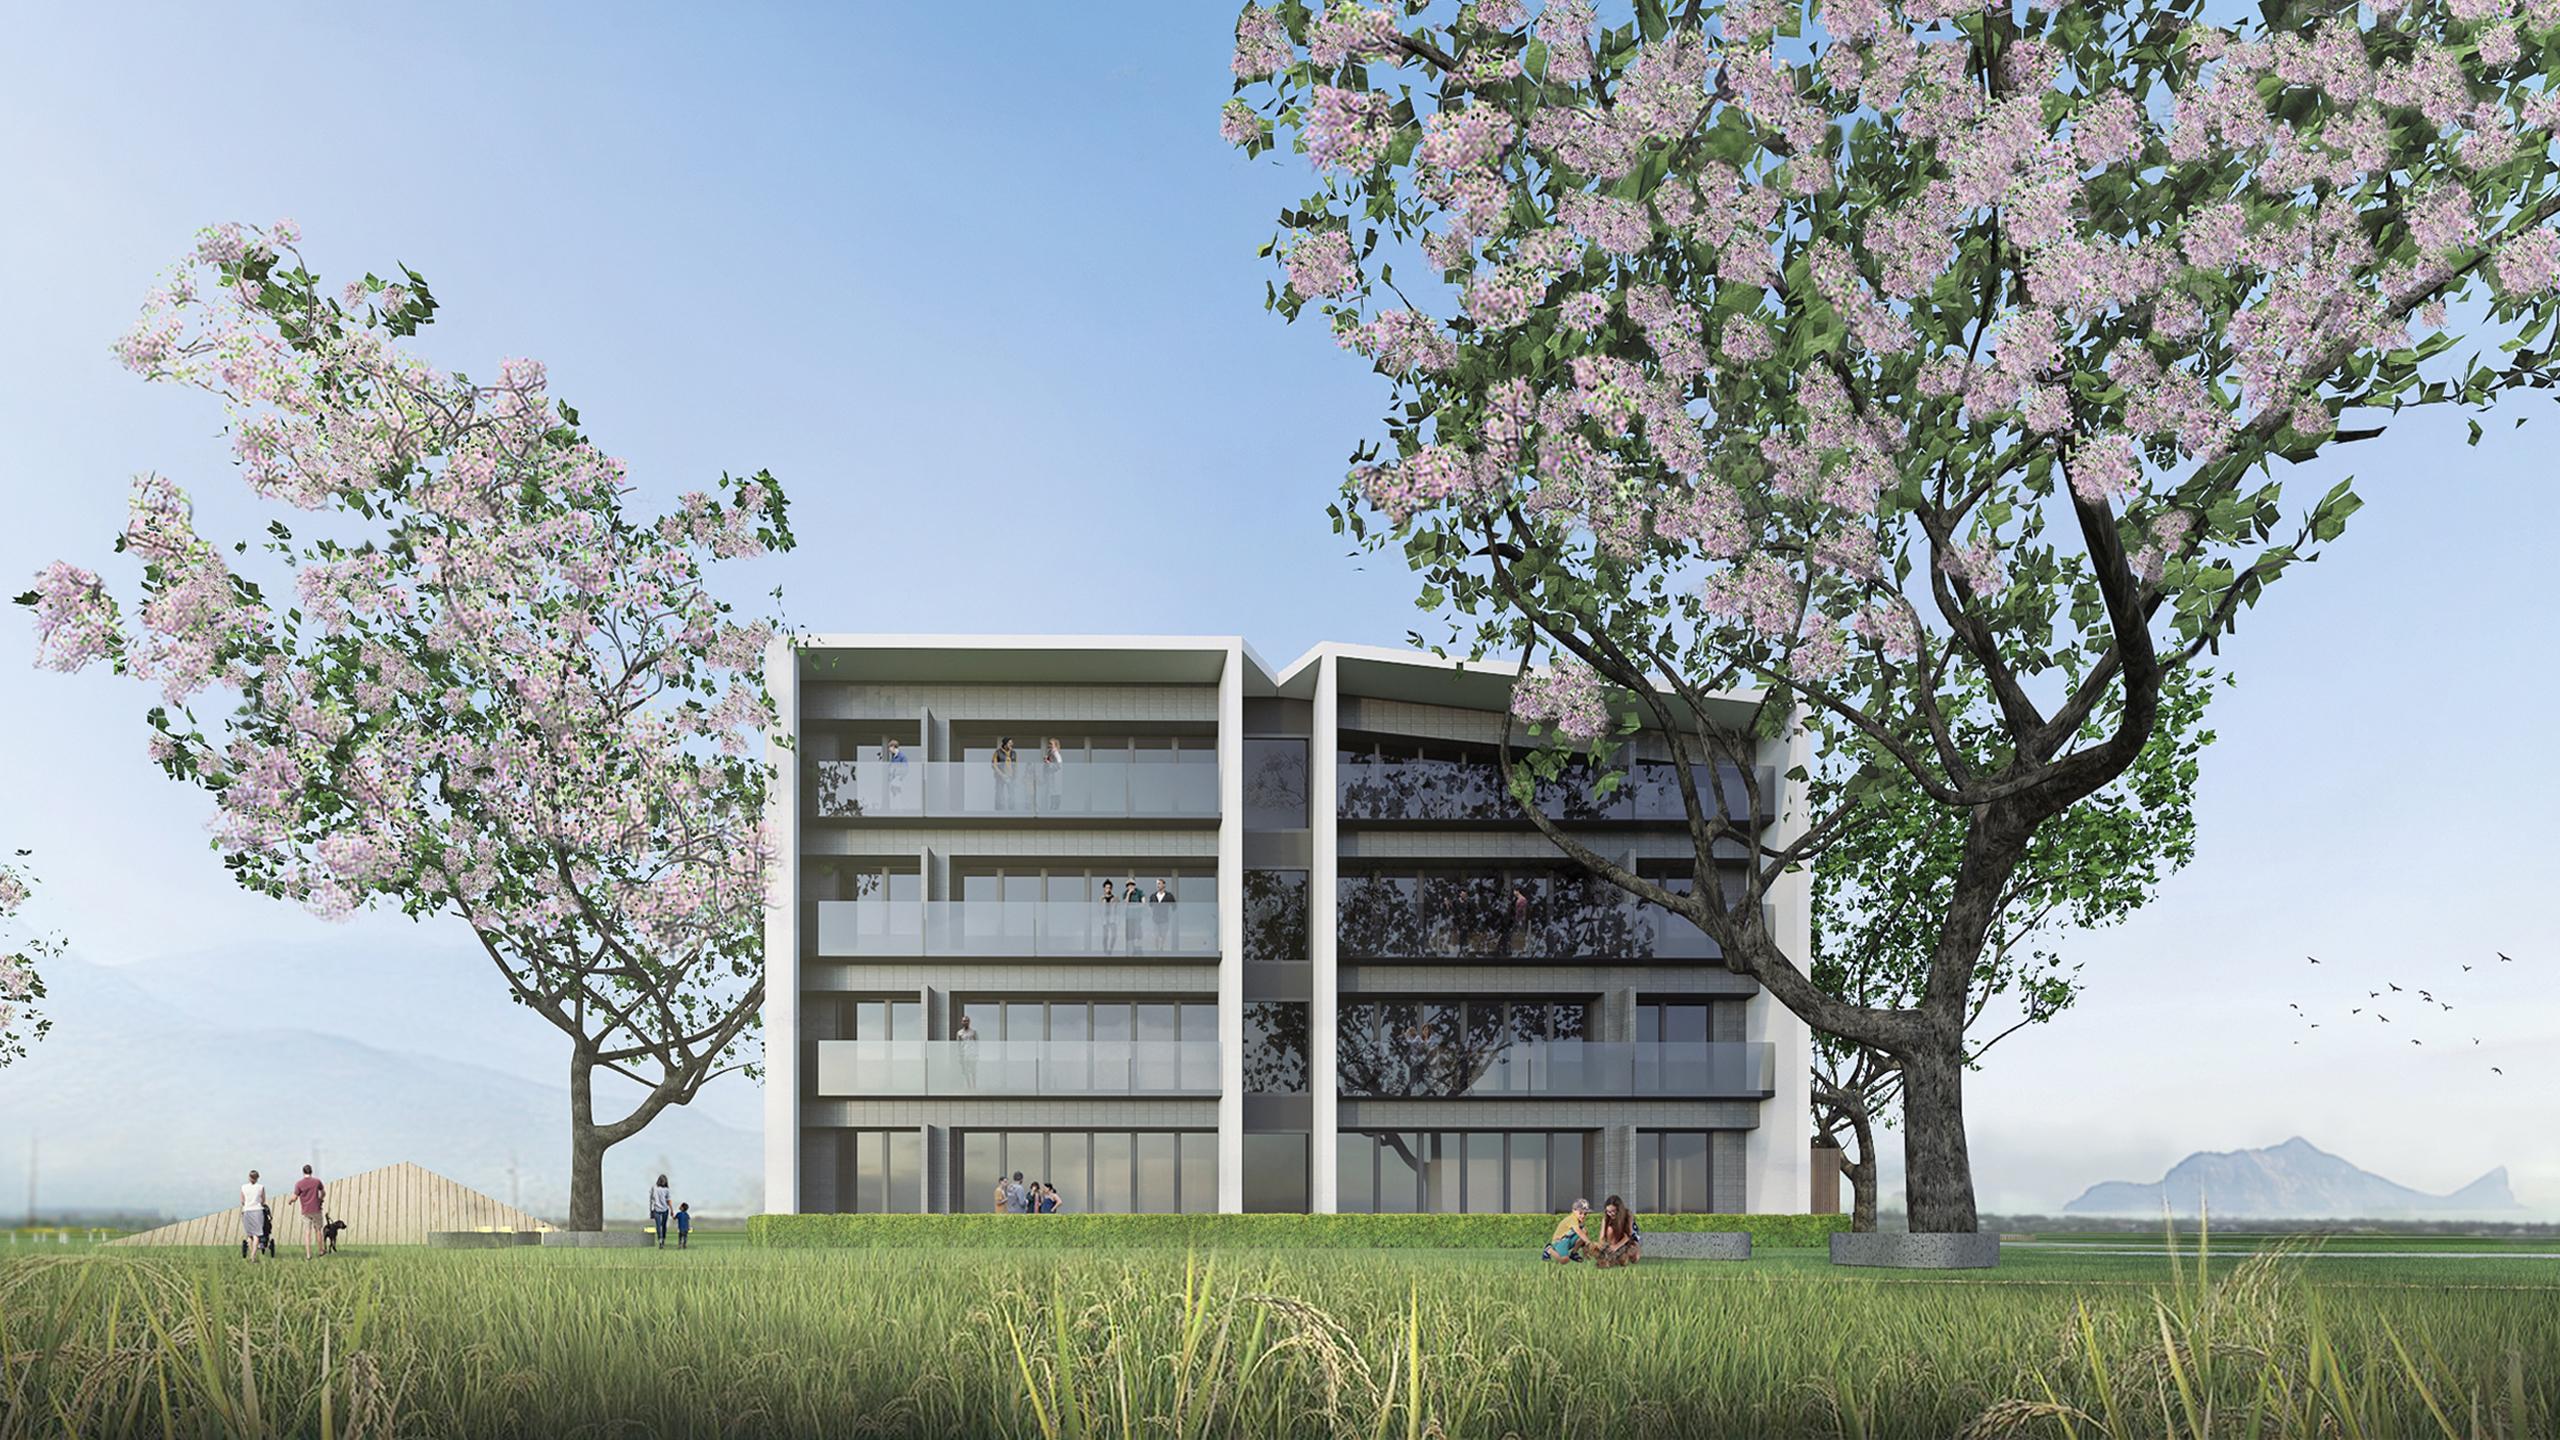 德築-DEZU-project-Zumi-architecture-3Drendering-2